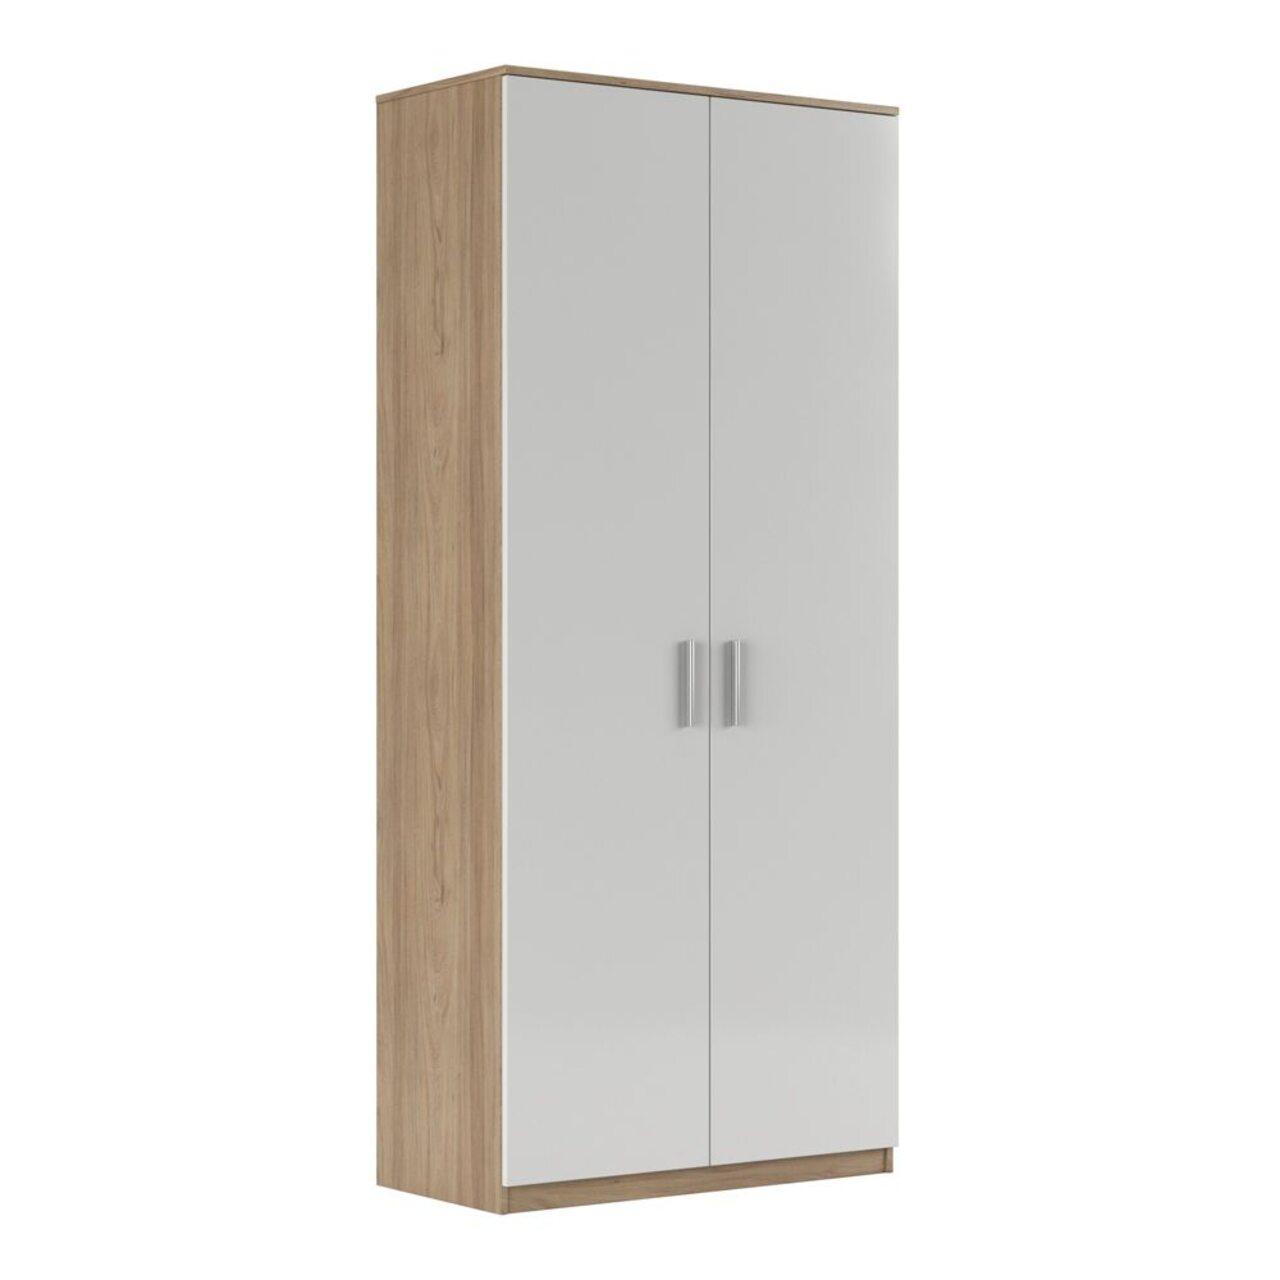 Шкаф для бумаг глухой (глянец)  ASTI 90x45x205 - фото 1